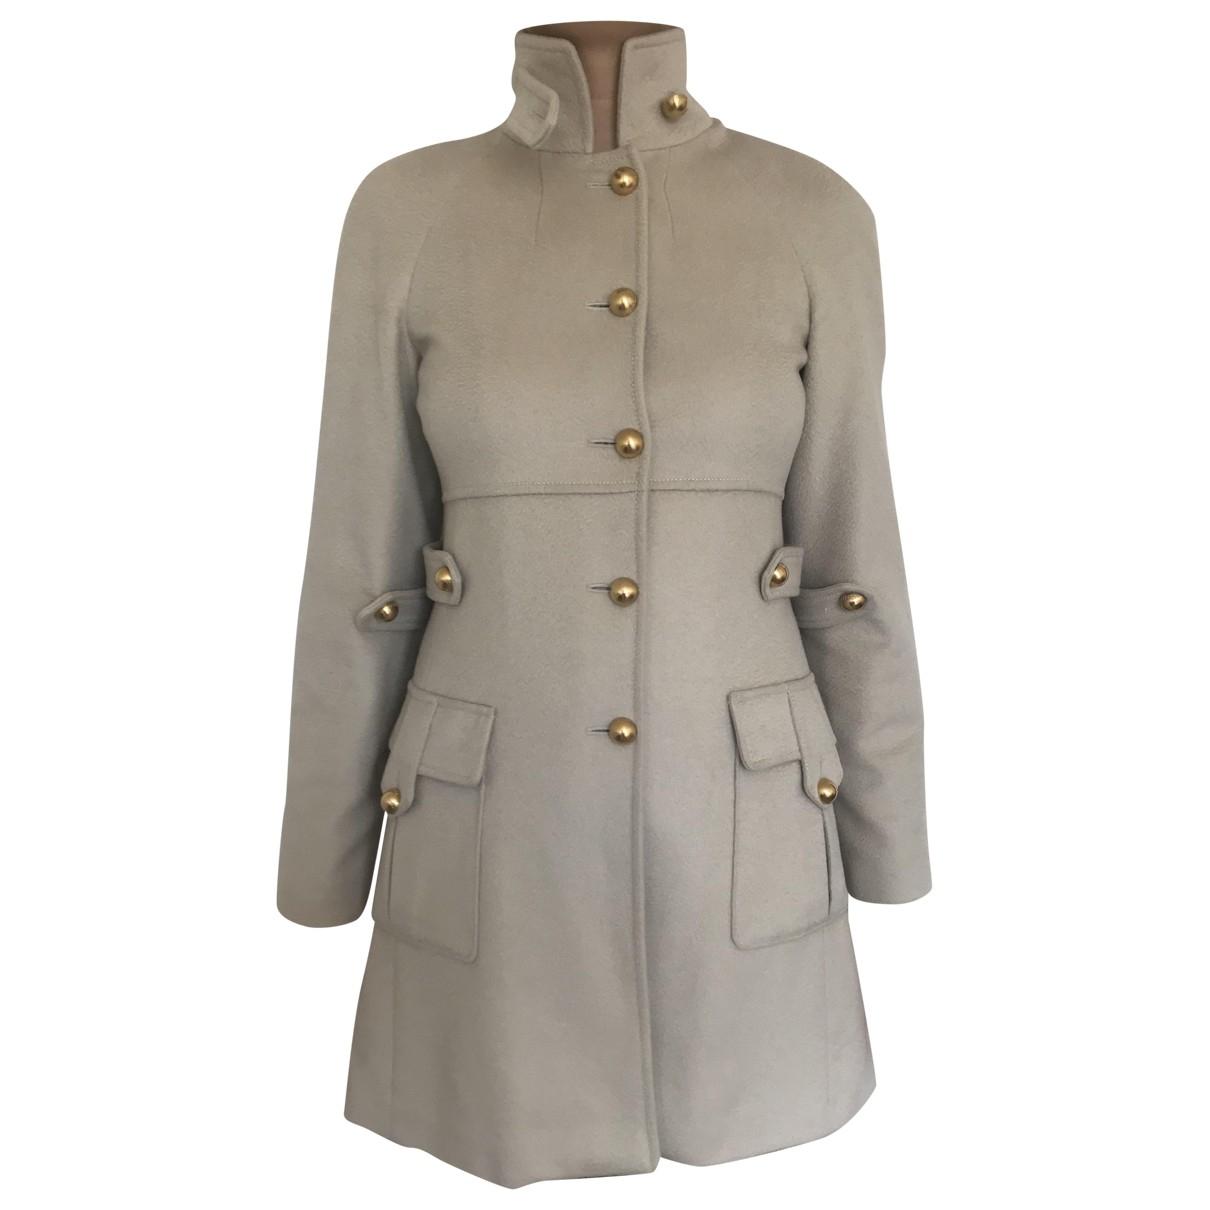 Fendi \N Beige Cashmere coat for Women 38 FR